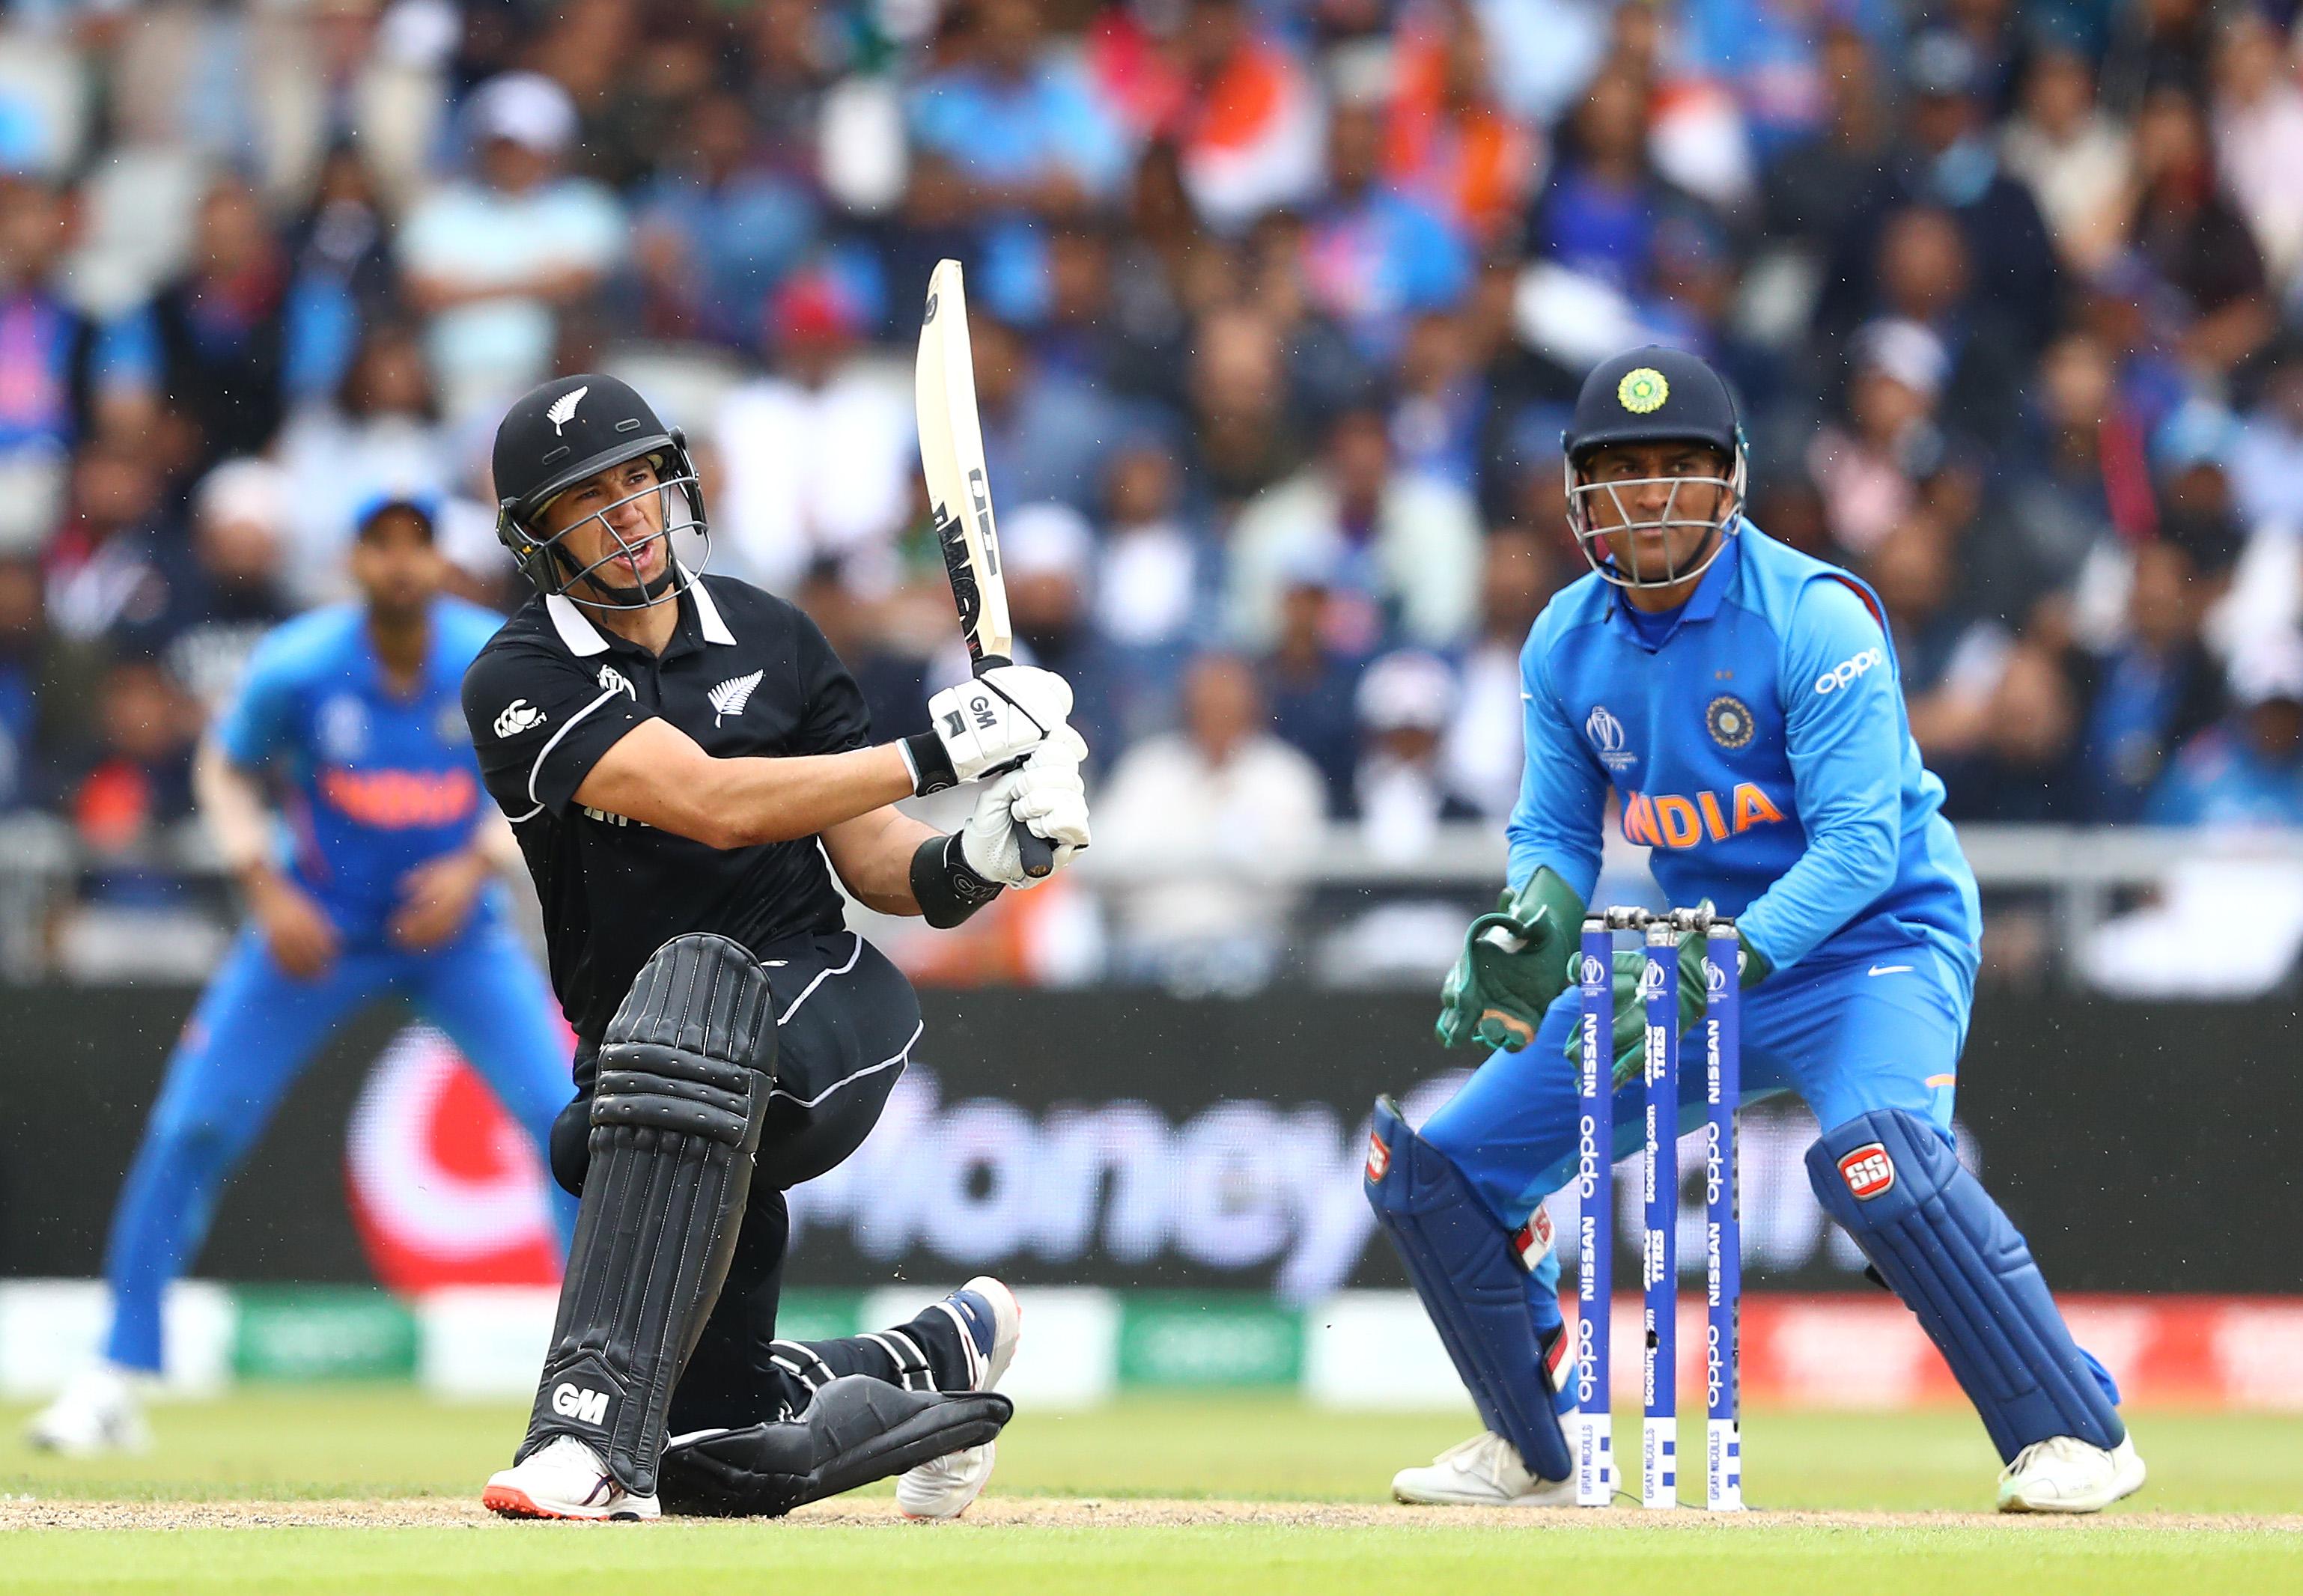 Ross Taylor ODI batting